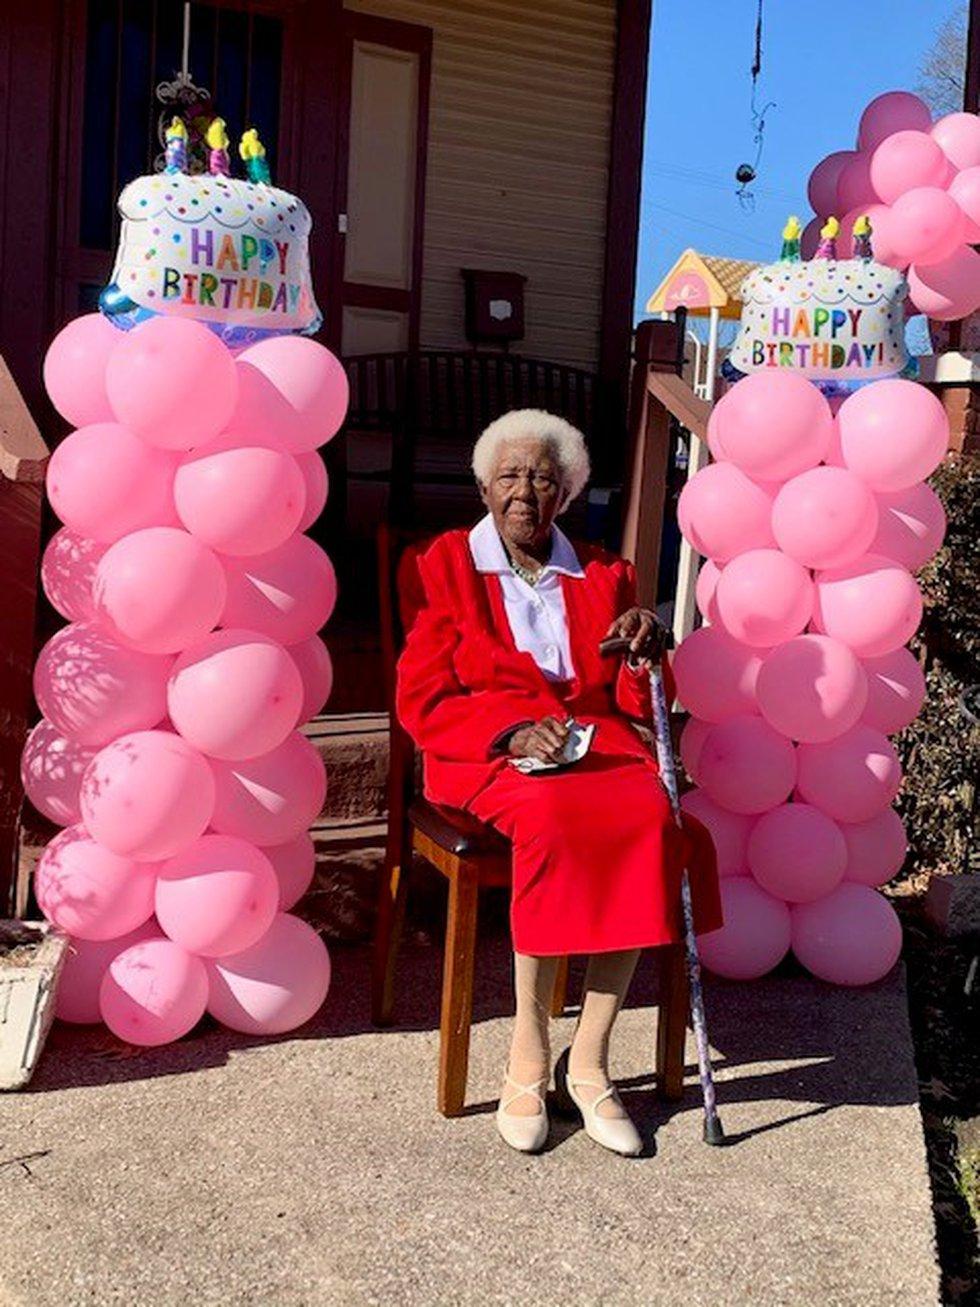 Mrs. Strait turns 105 years old.